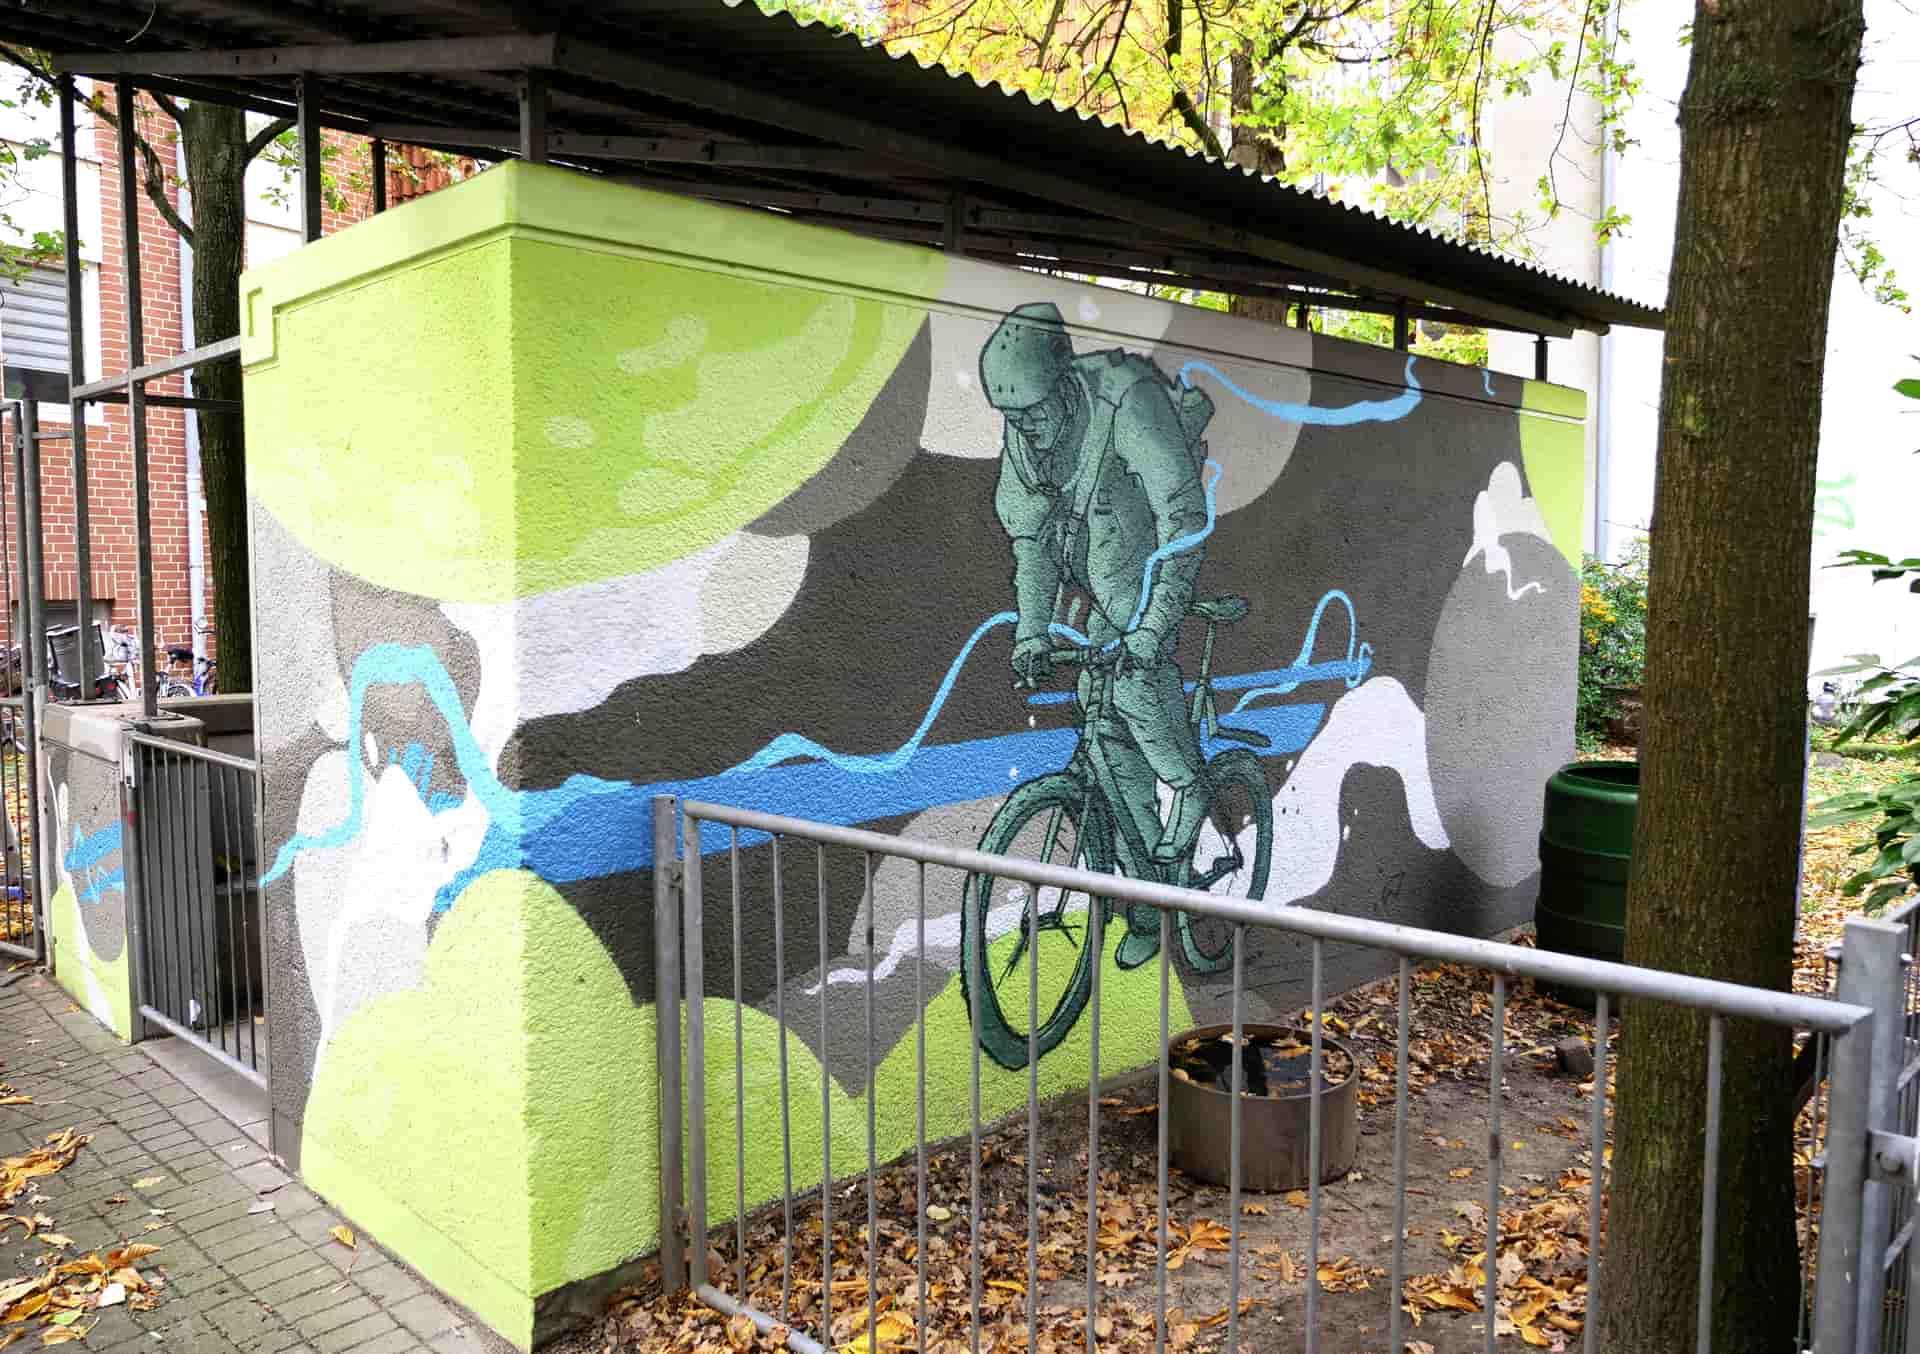 Fahrrad Graffiti in Gruen